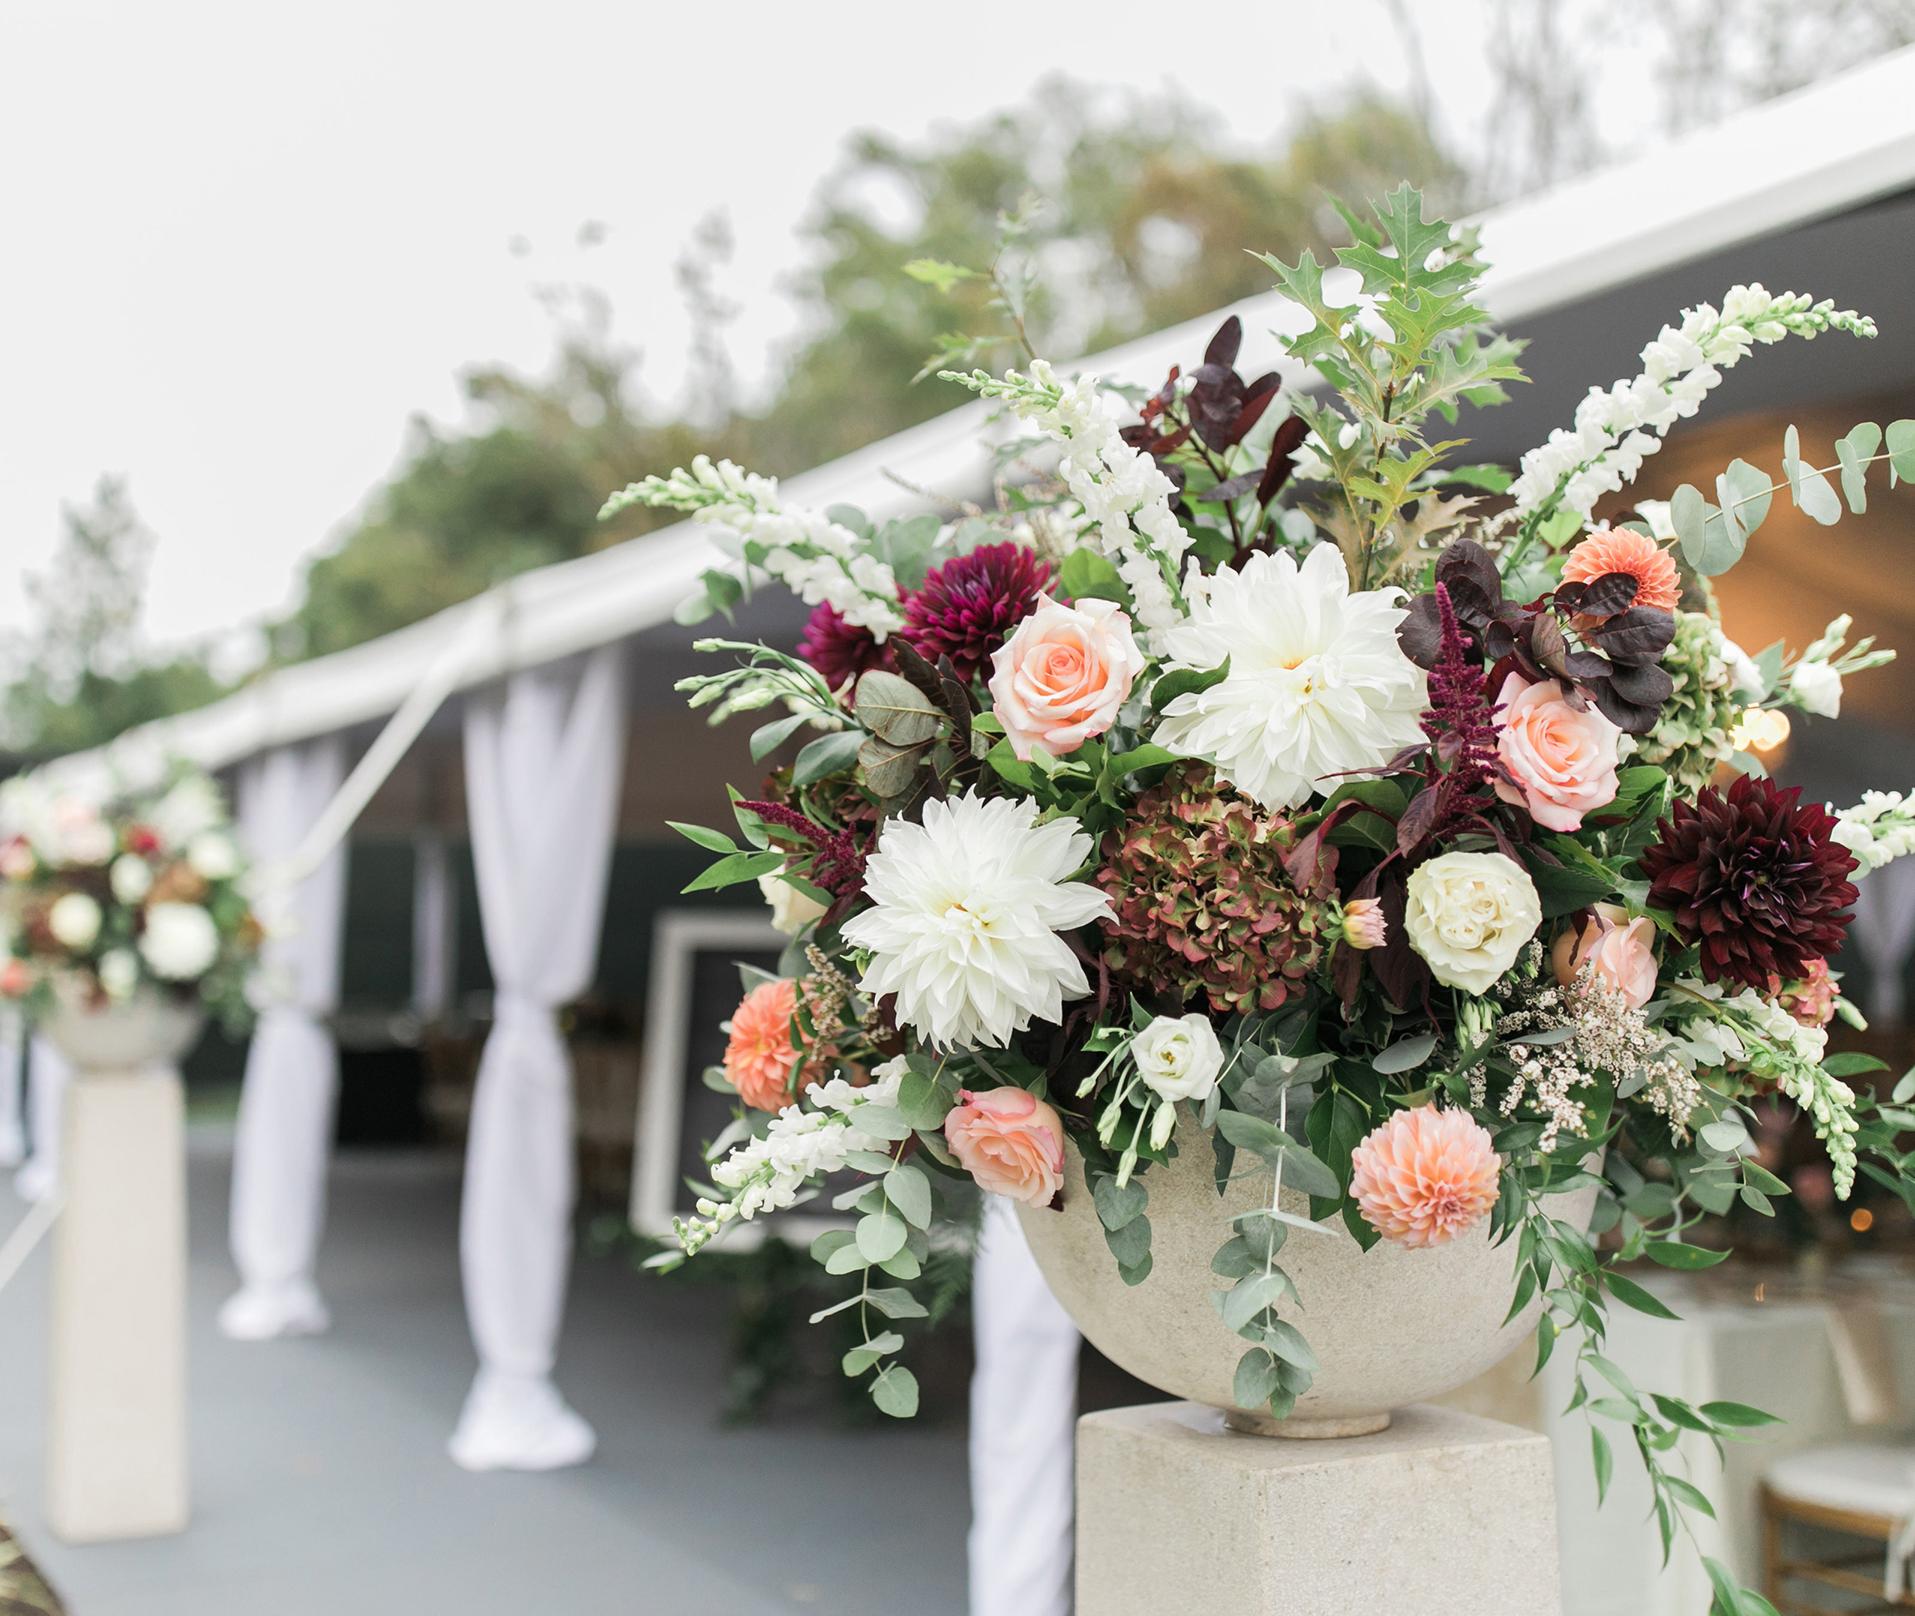 wedding_flowers_reception_autumn_outdoor_tent